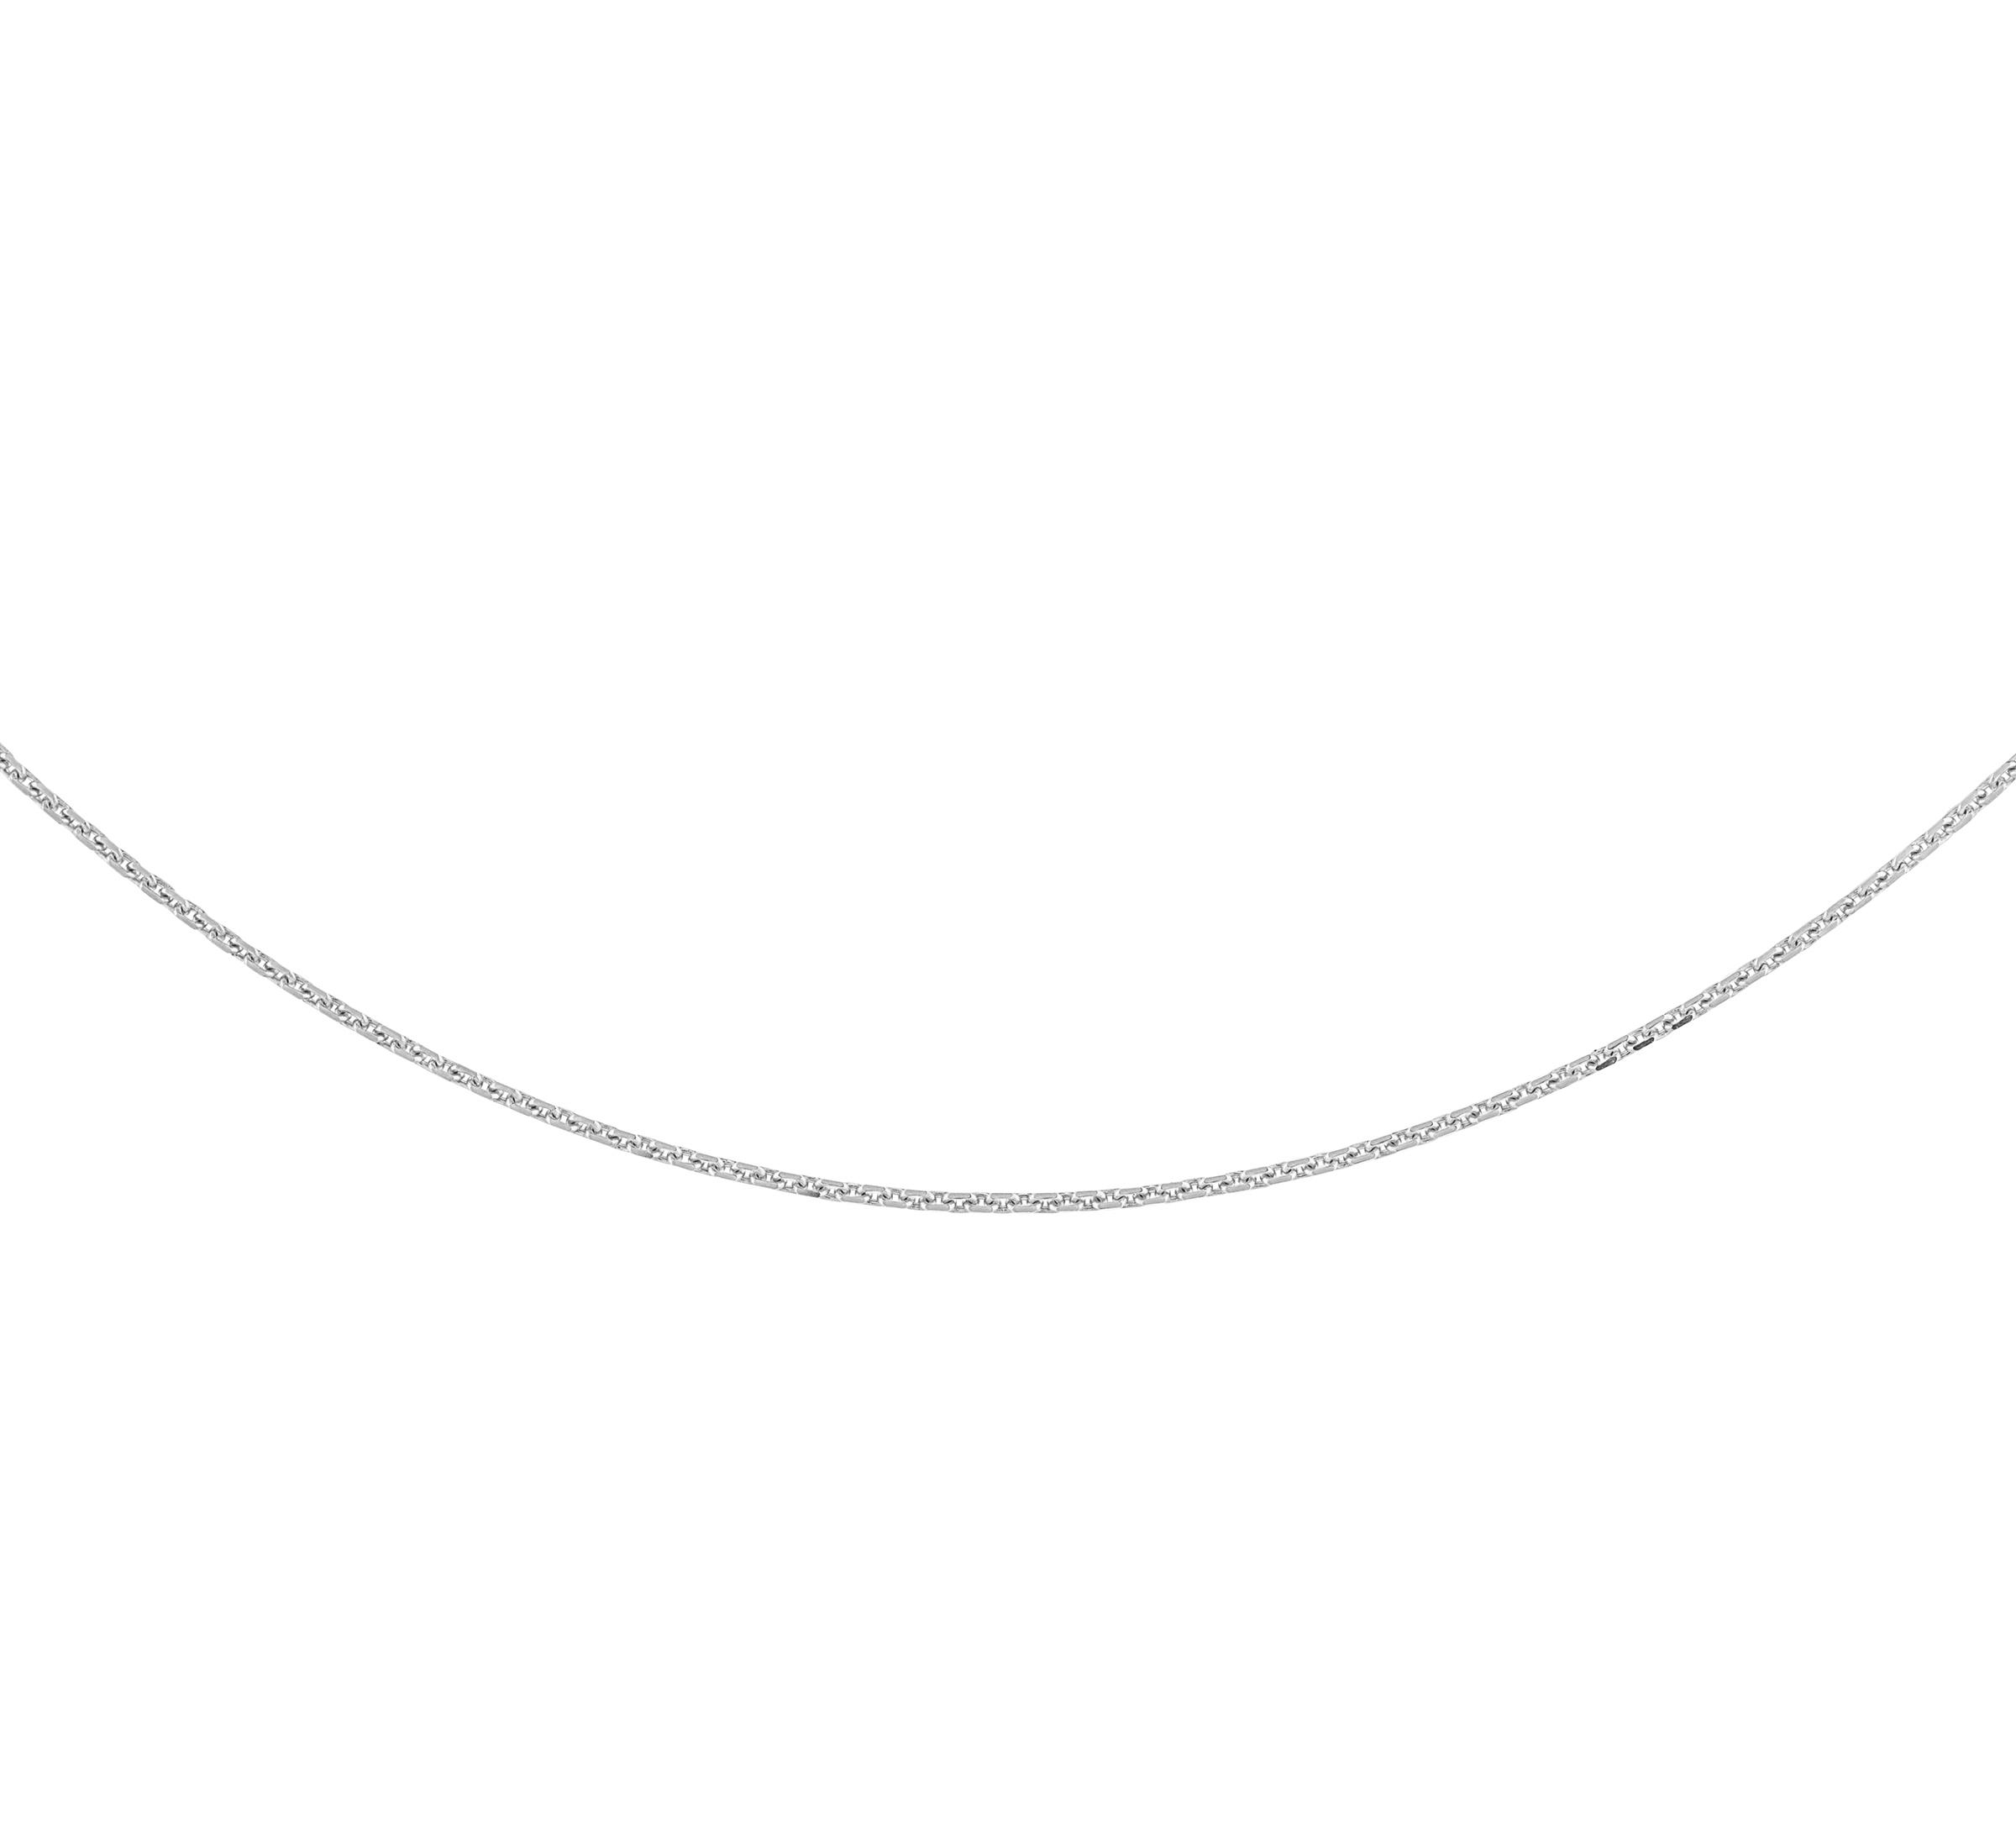 18'' Links style chain for women - 10K white Gold